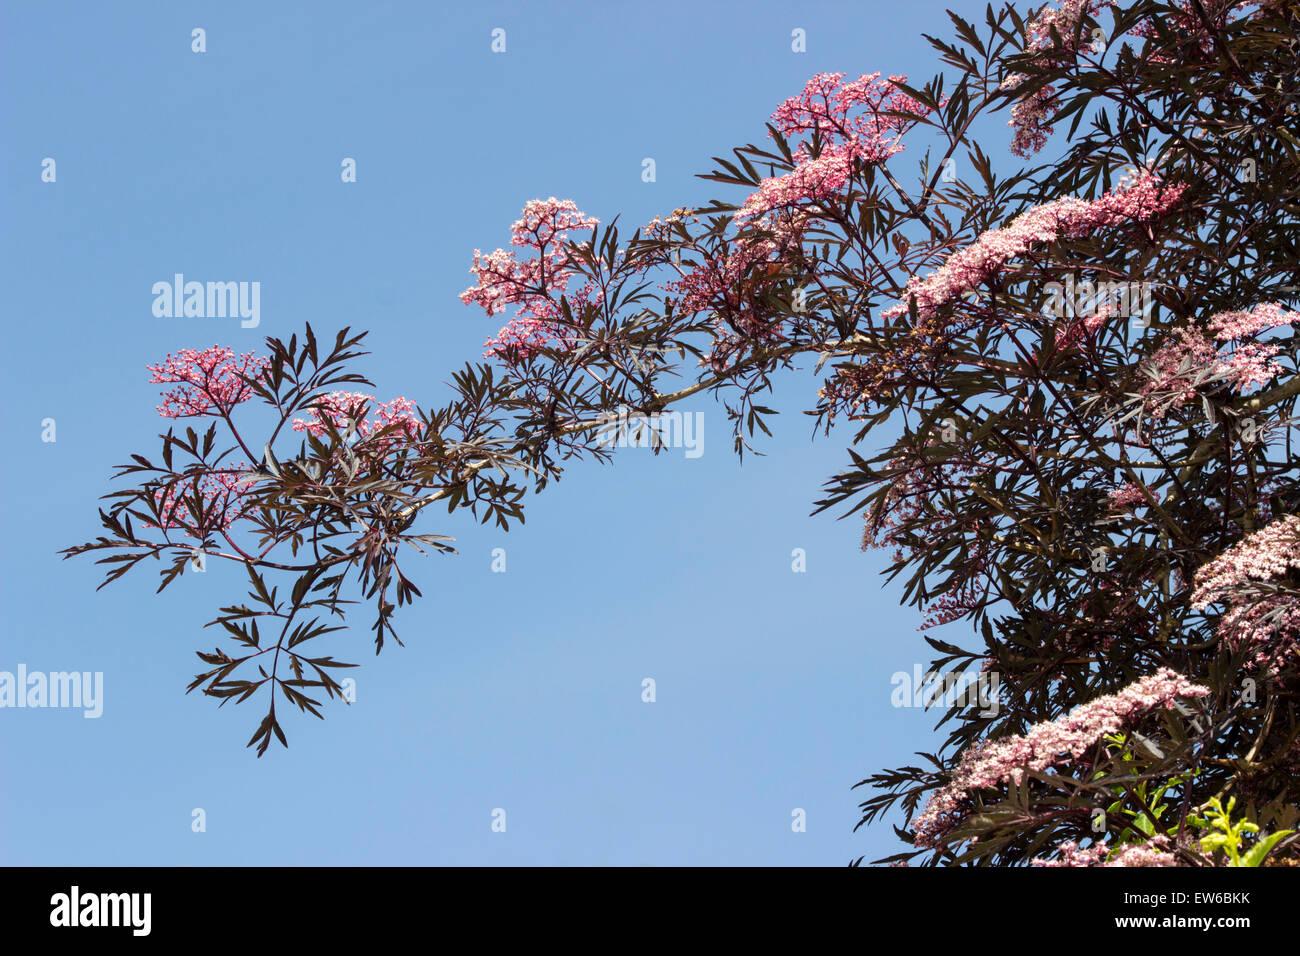 A flowering branch of the cut leaved elder, Sambucus nigra 'Black Lace' set against a blue June sky. - Stock Image